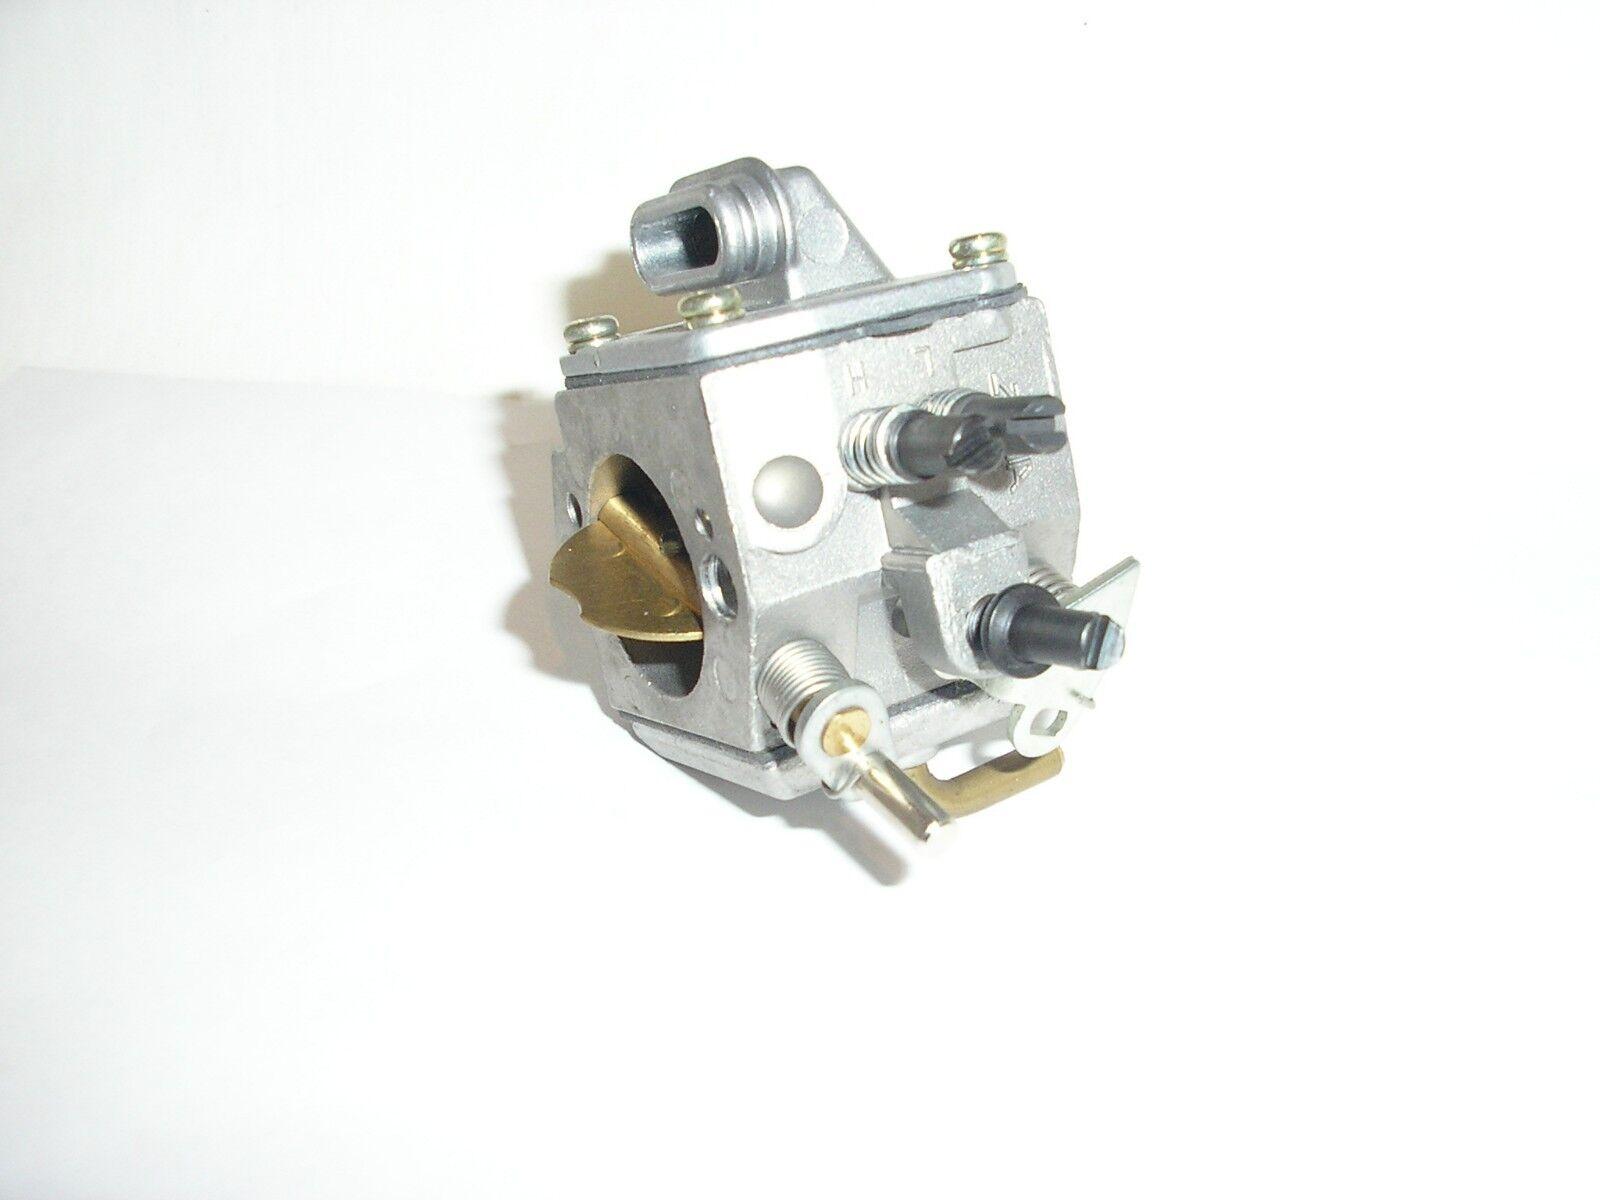 STIHL 044, 046, MS440, MS460 Reemplazo Cocheburador STIHL parte   1128-120-0625